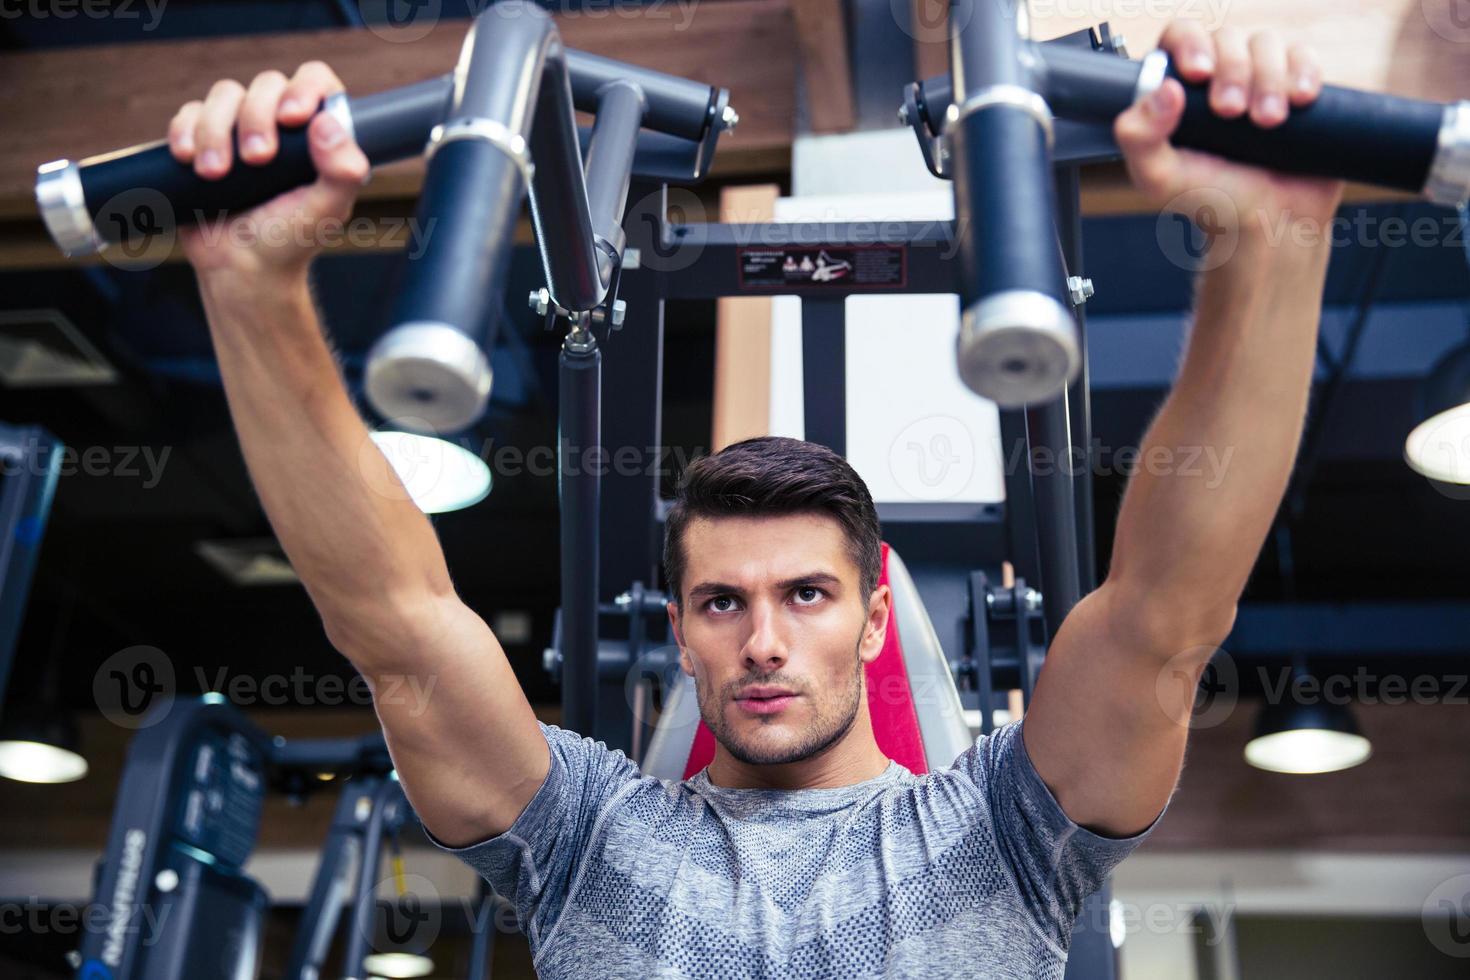 homme, faire, exercice, fitness, machine, dans, gymnase photo